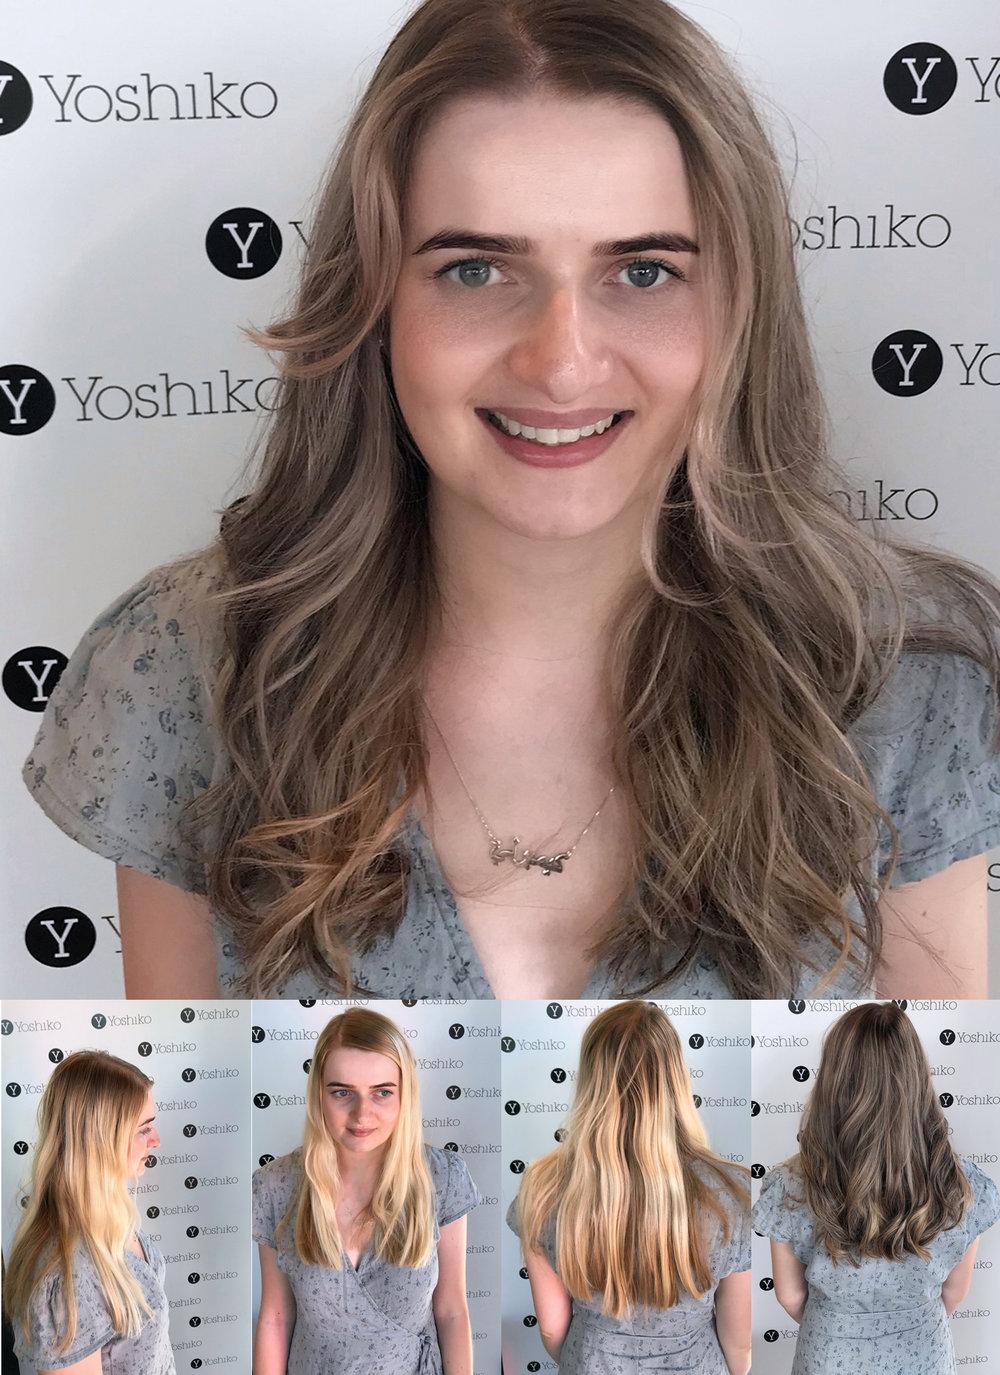 colour correction._yoshiko hair_st kilda hairdresser_hair colour_st kidals best salon_jhairdresser pg